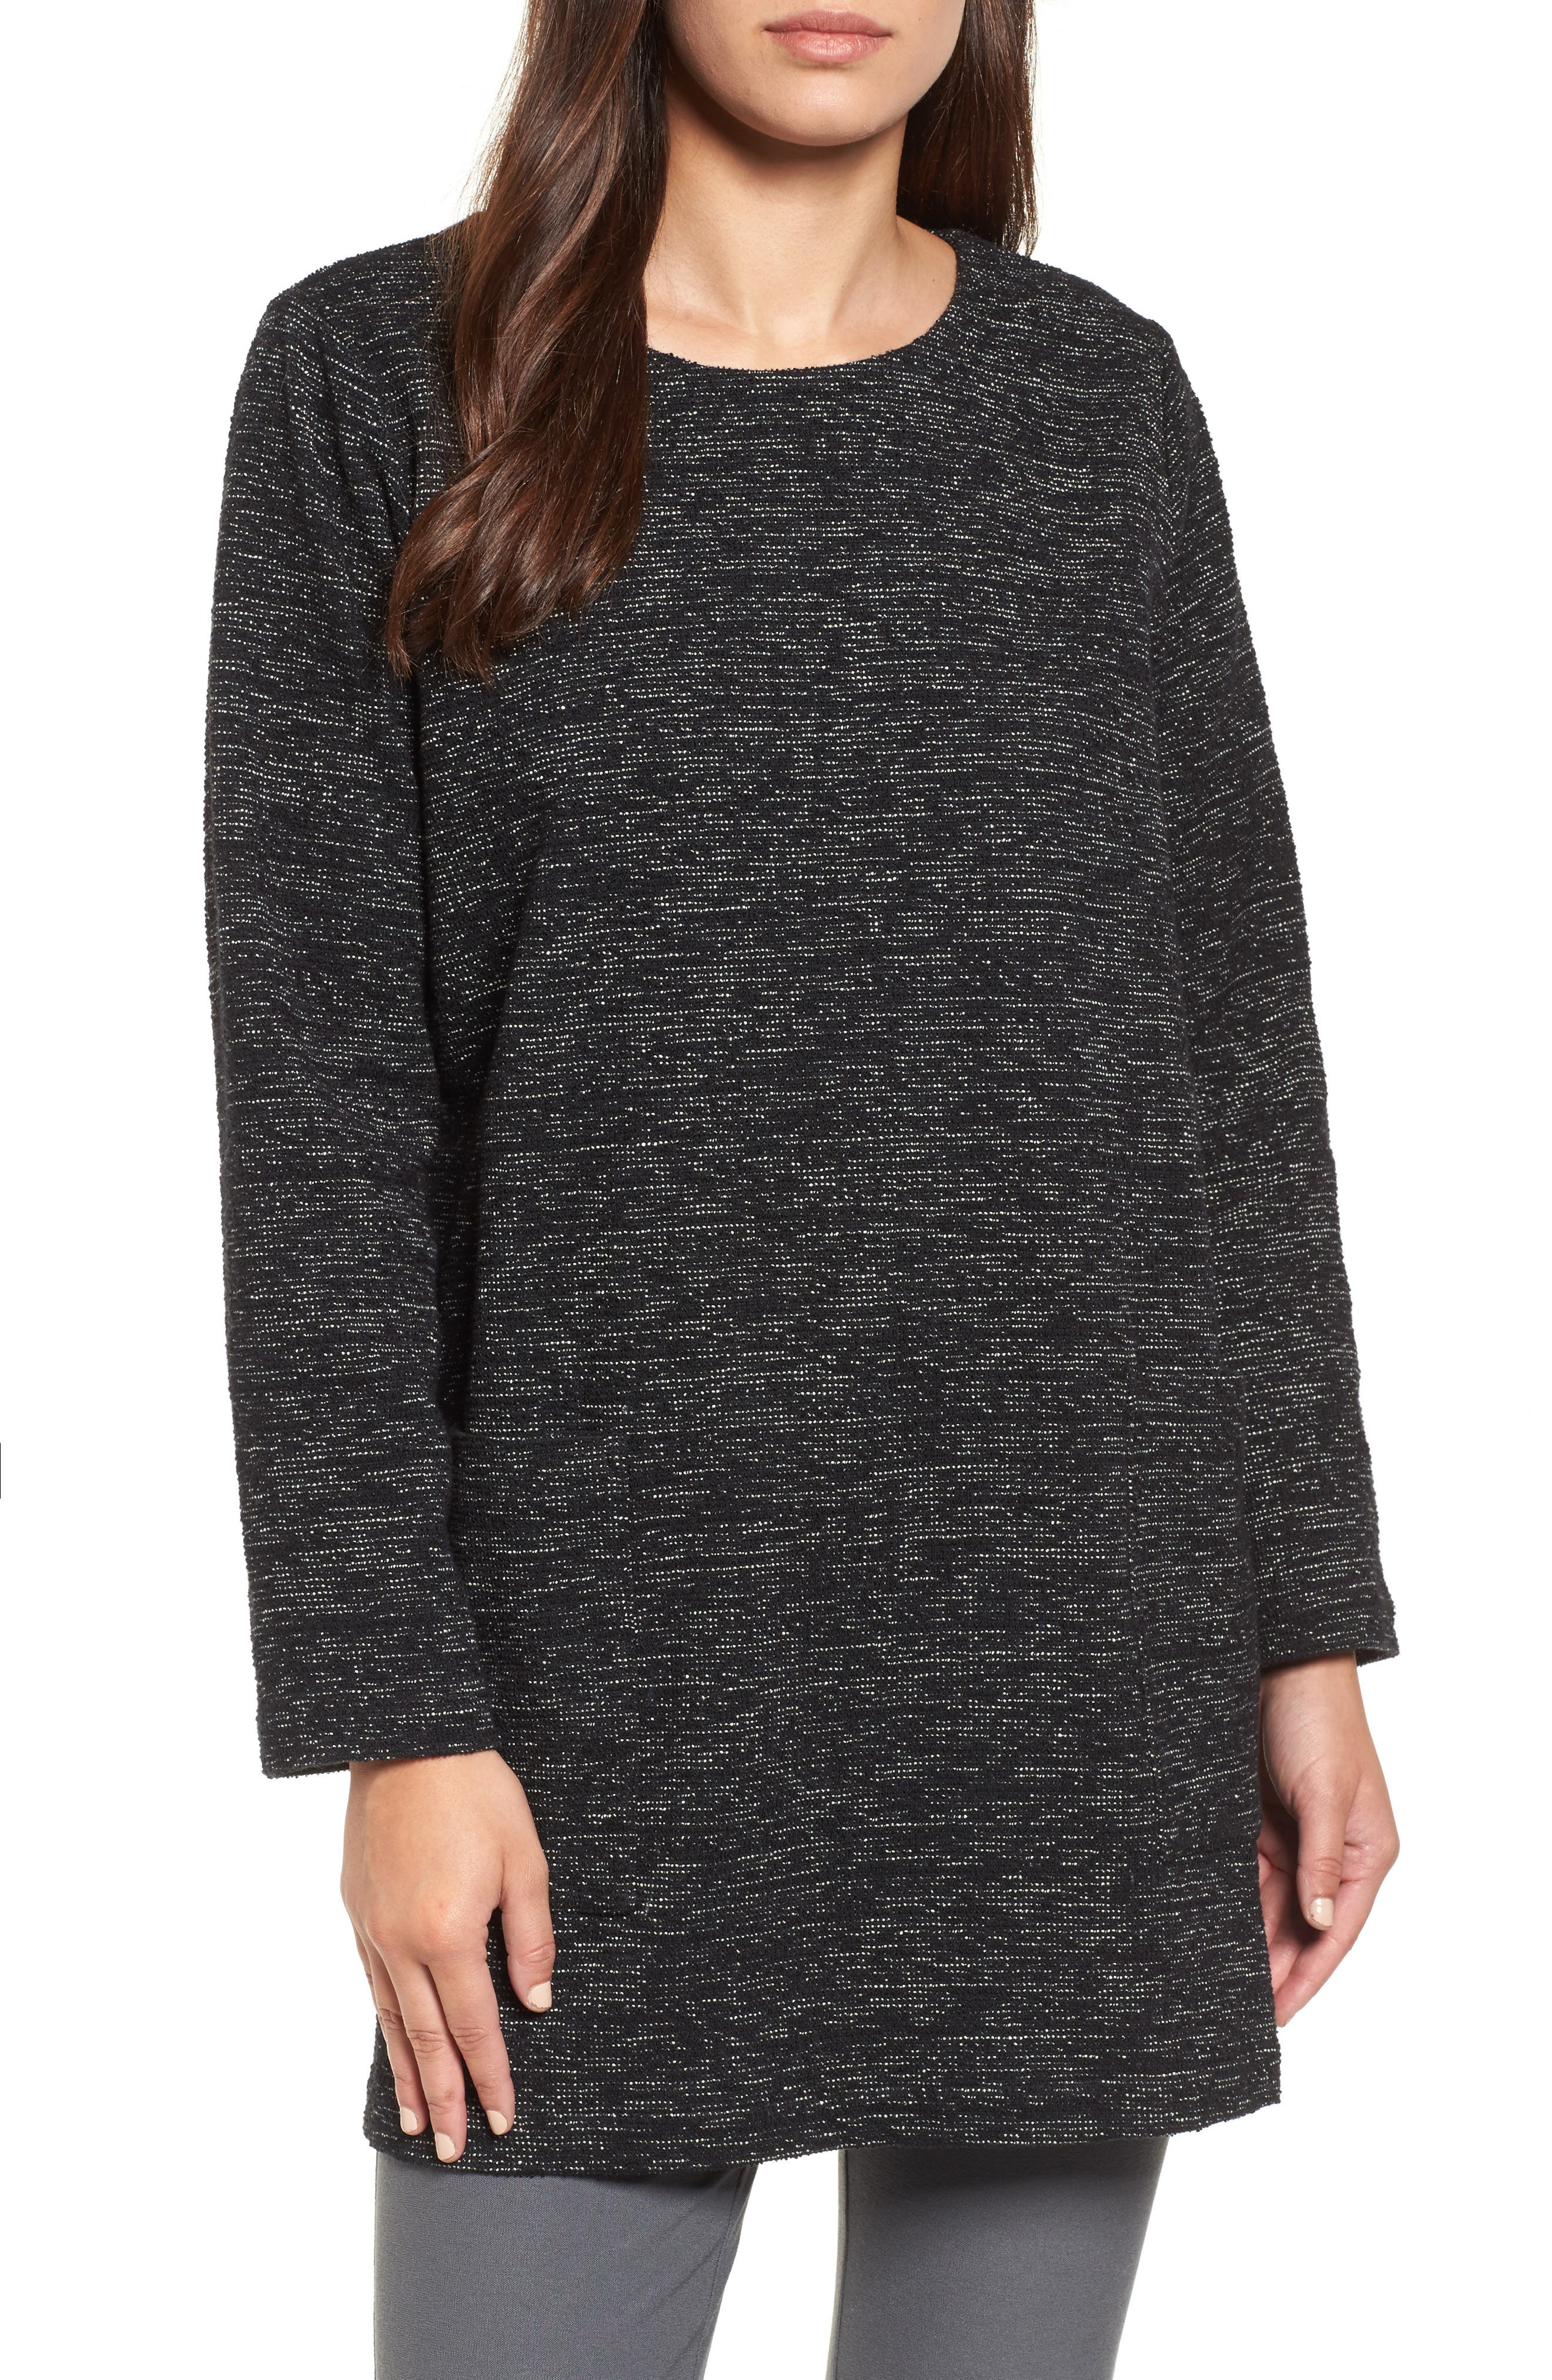 Boxy Organic Cotton Blend Tunic Sweater,                             Main thumbnail 1, color,                             Black